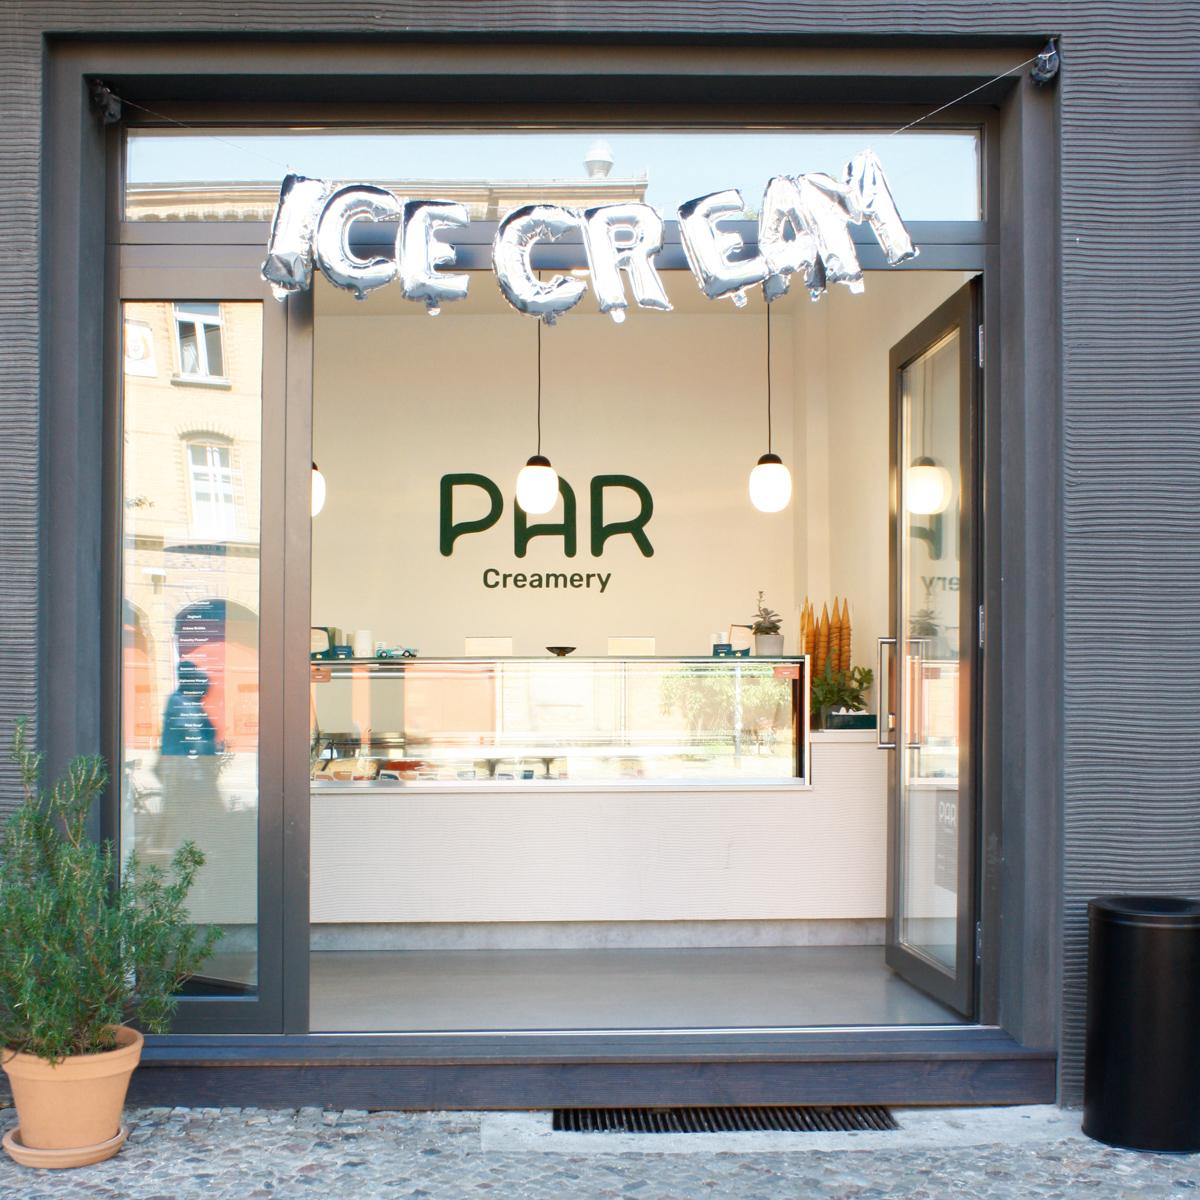 Par Creamery Eisdiele Berlin Prenzlauer Berg-4